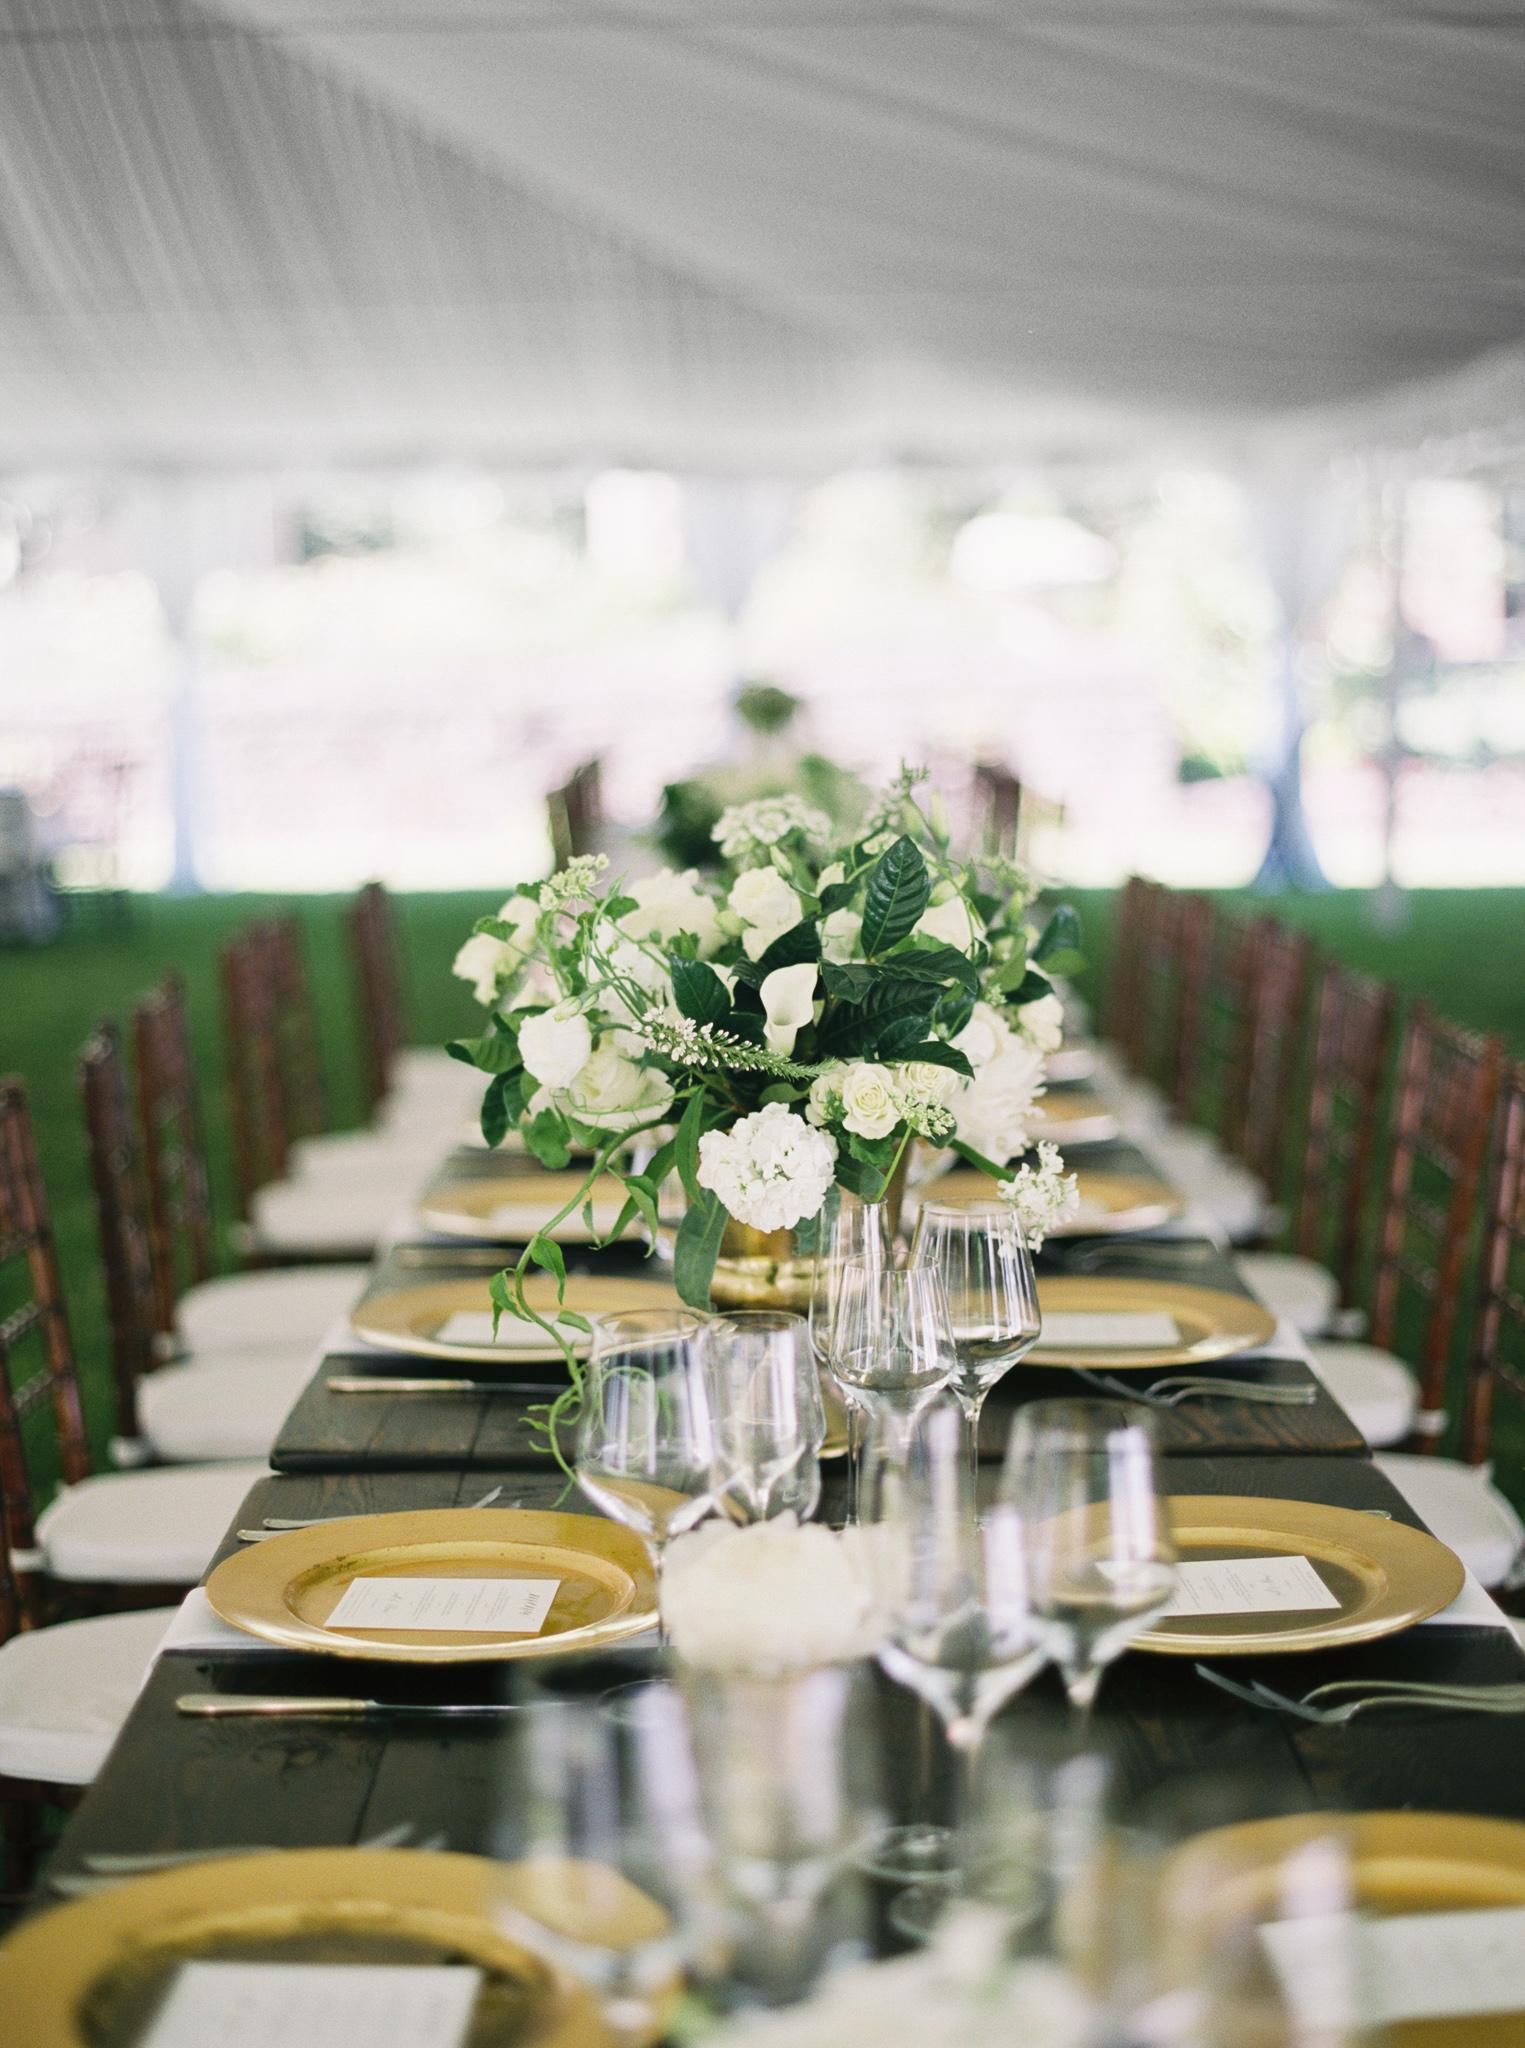 176OutliveCreative_Travel_Photographer_Videographer_Lewis&Clark_Oregon_Elegant_BlackTie_Destination_Wedding.jpg